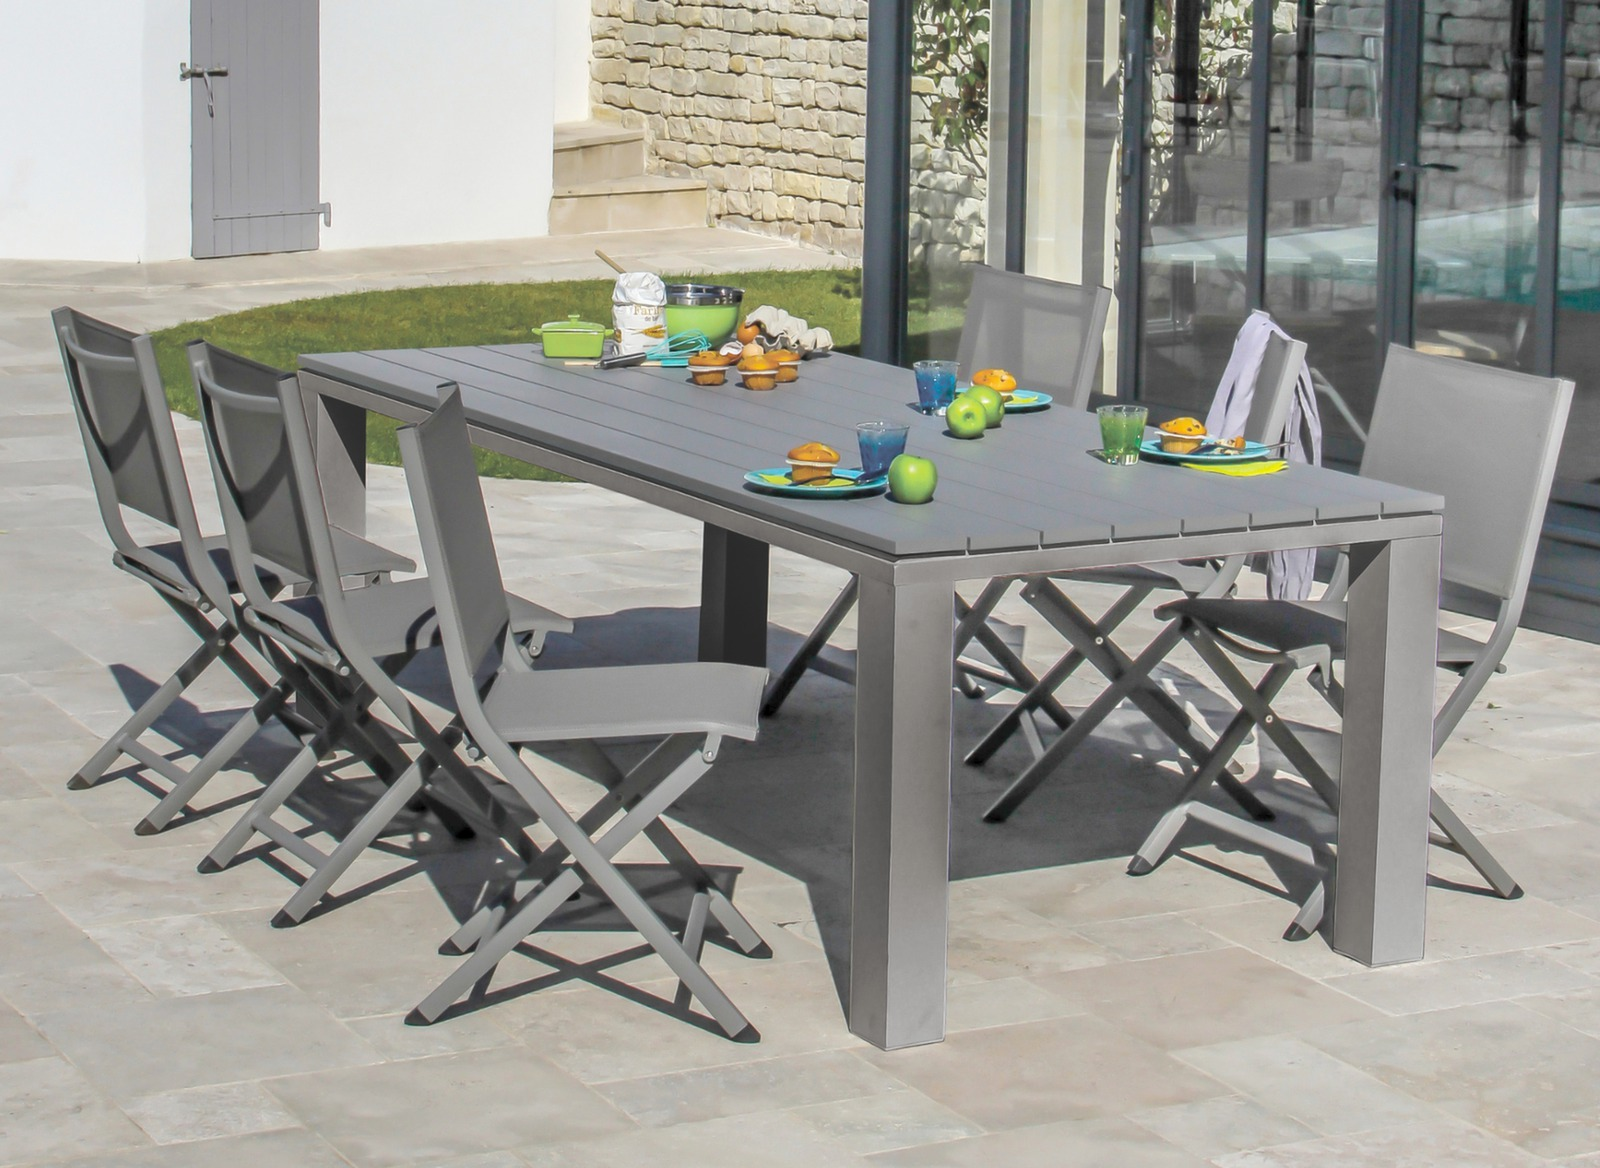 Soldes meubles jardin finest awesome salon de jardin for Meubles carrefour soldes